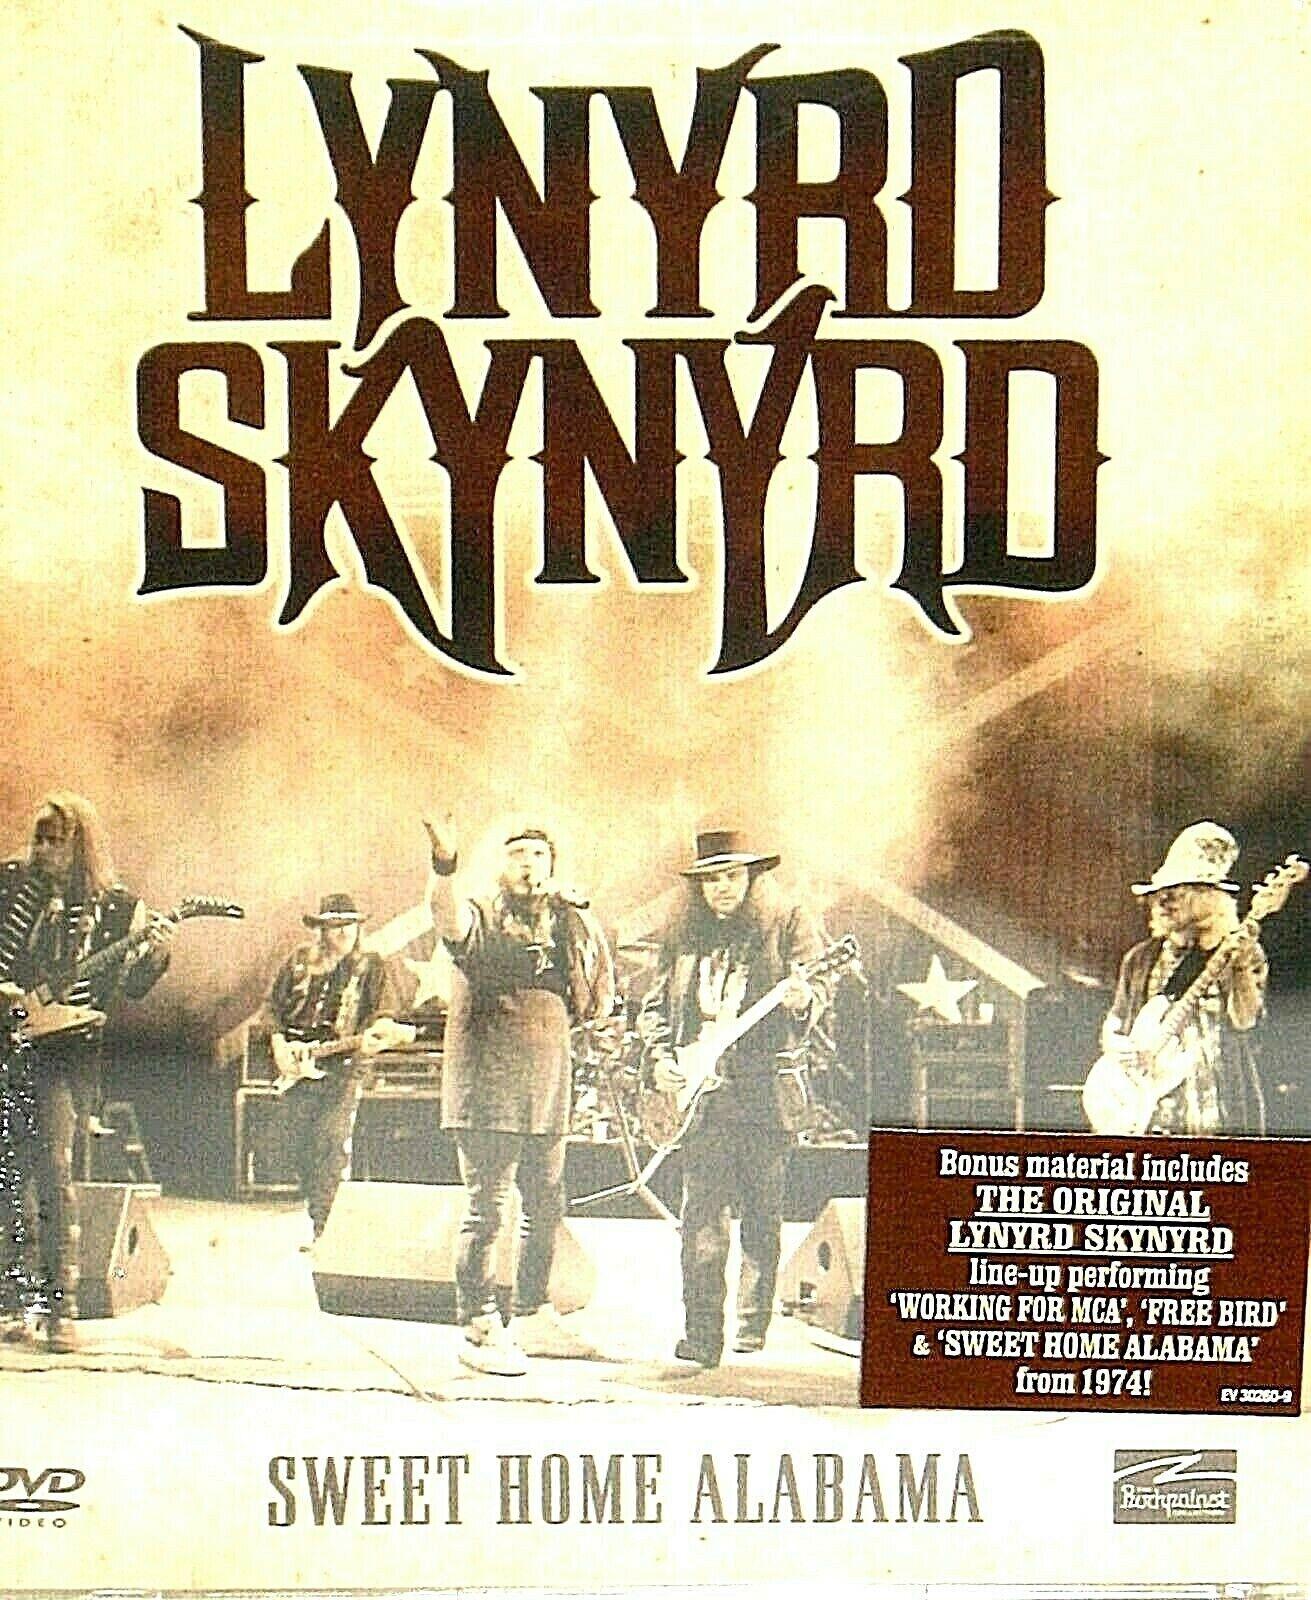 Sep 14, 2018· order live in atlantic city here: Lynyrd Skynyrd Sweet Home Alabama Dvd 2008 For Sale Online Ebay